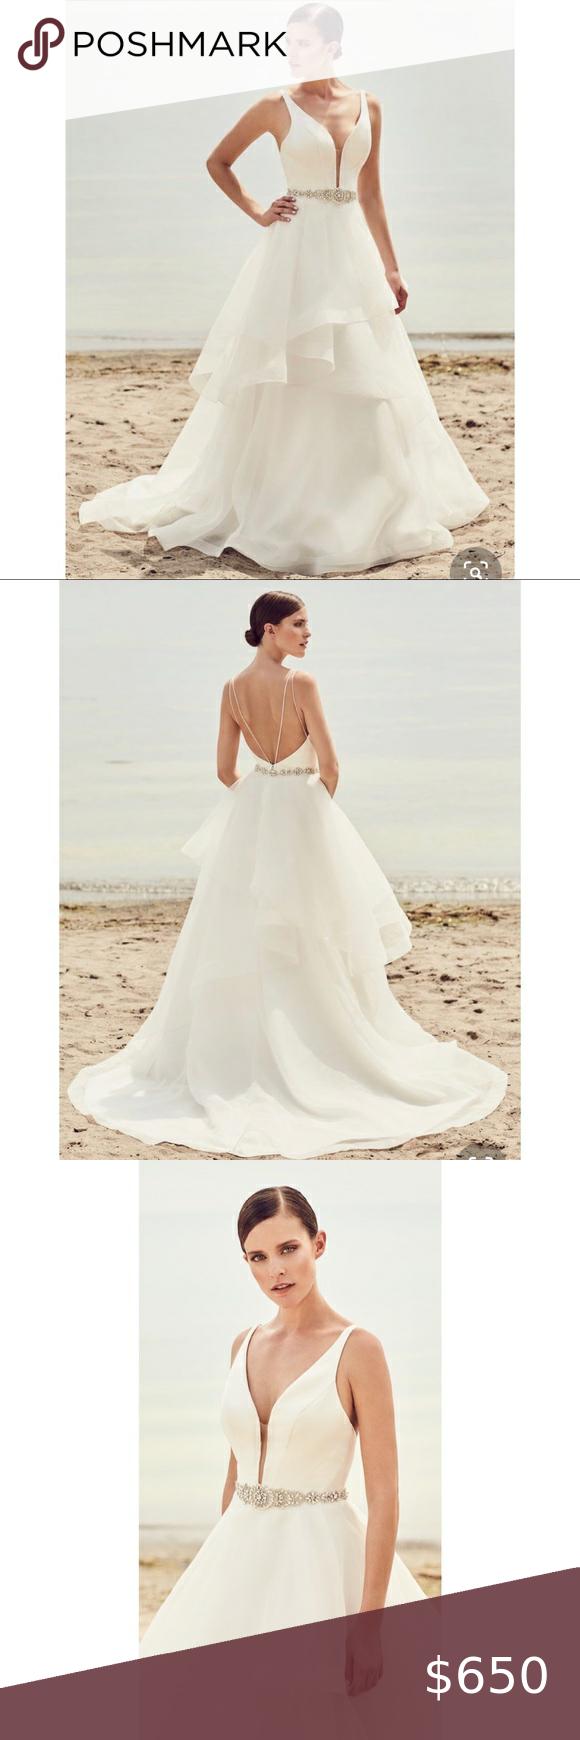 Mikaella Bridal Style 2112 Size 12 Unaltered In 2020 Bridal Style Mikaella Bridal Bridal